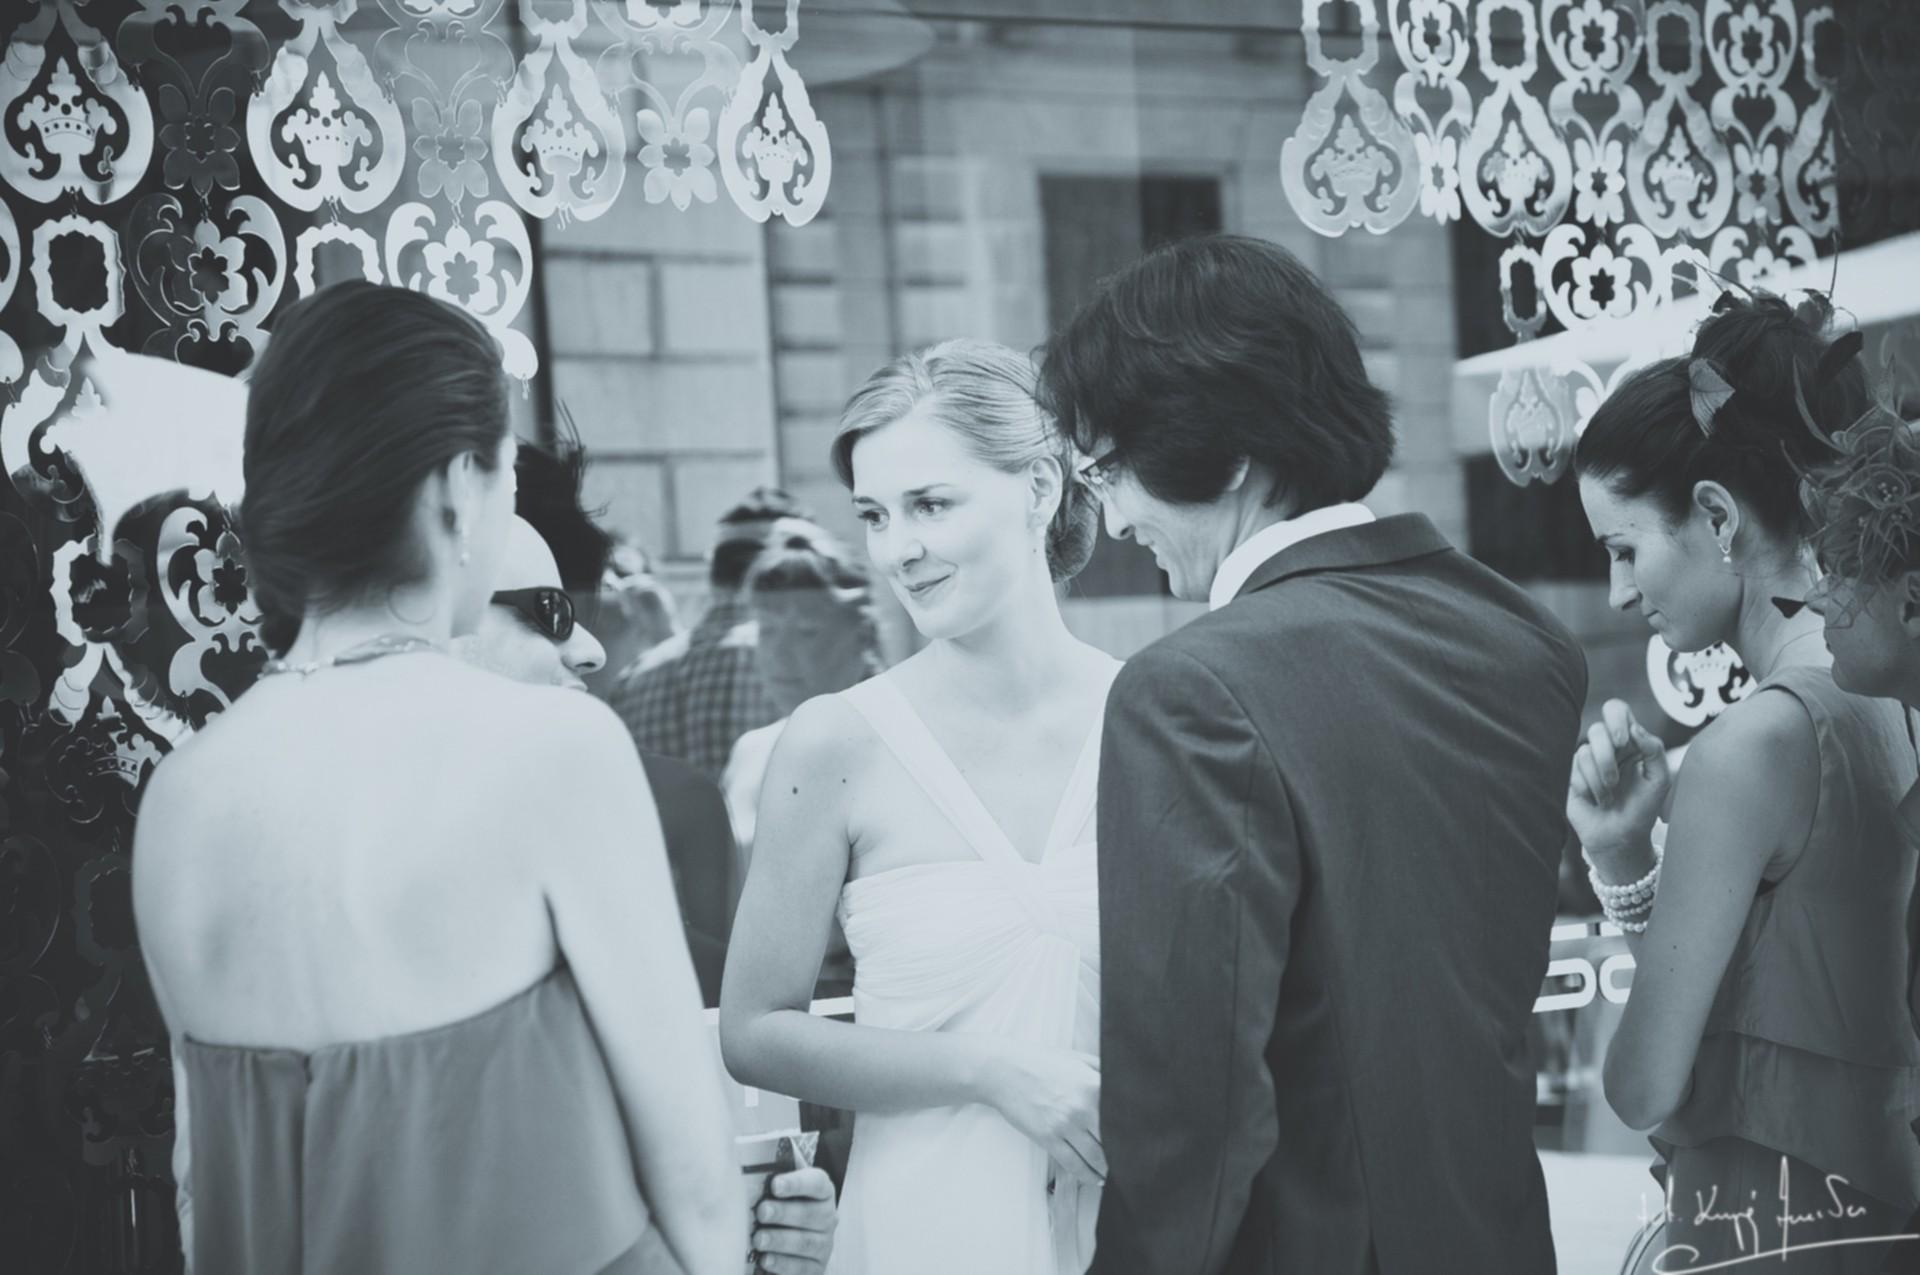 Ślub w wenecji 53 Manuela Luiza & Young Seon Song